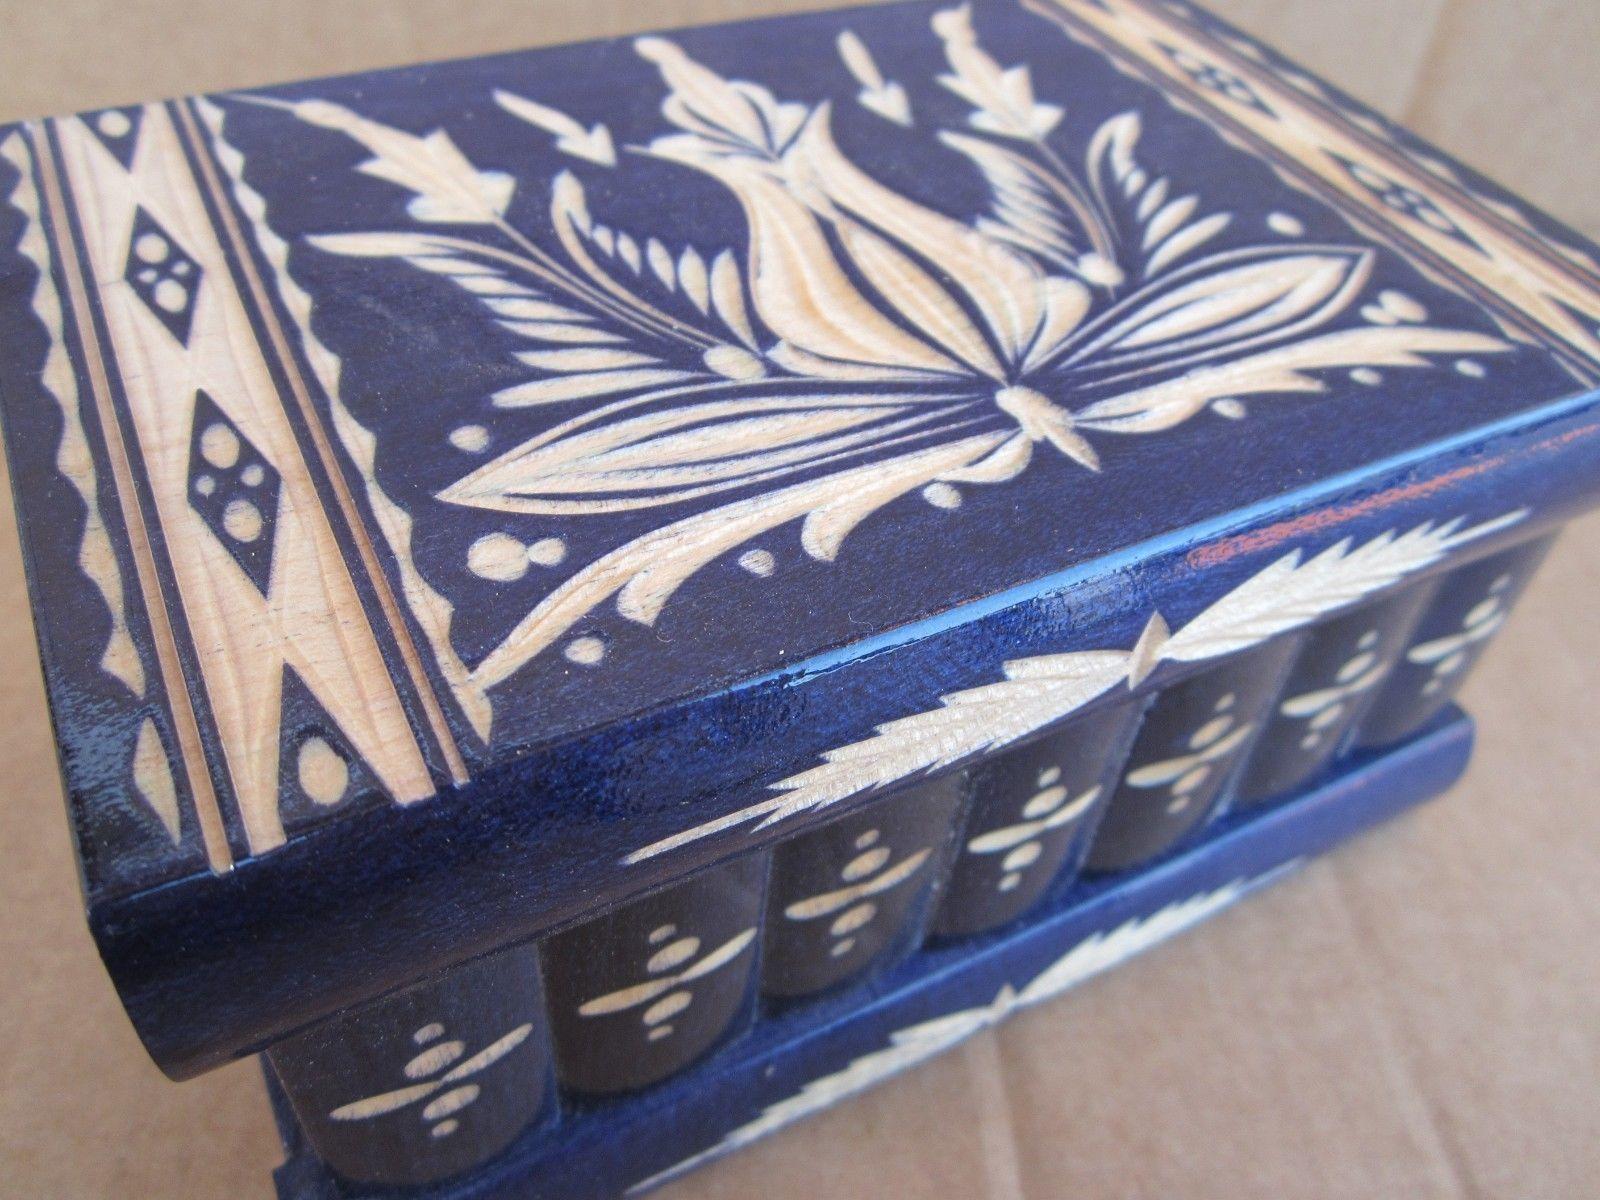 Transylvanian Highlander Puzzle Trick Box and 21 similar items